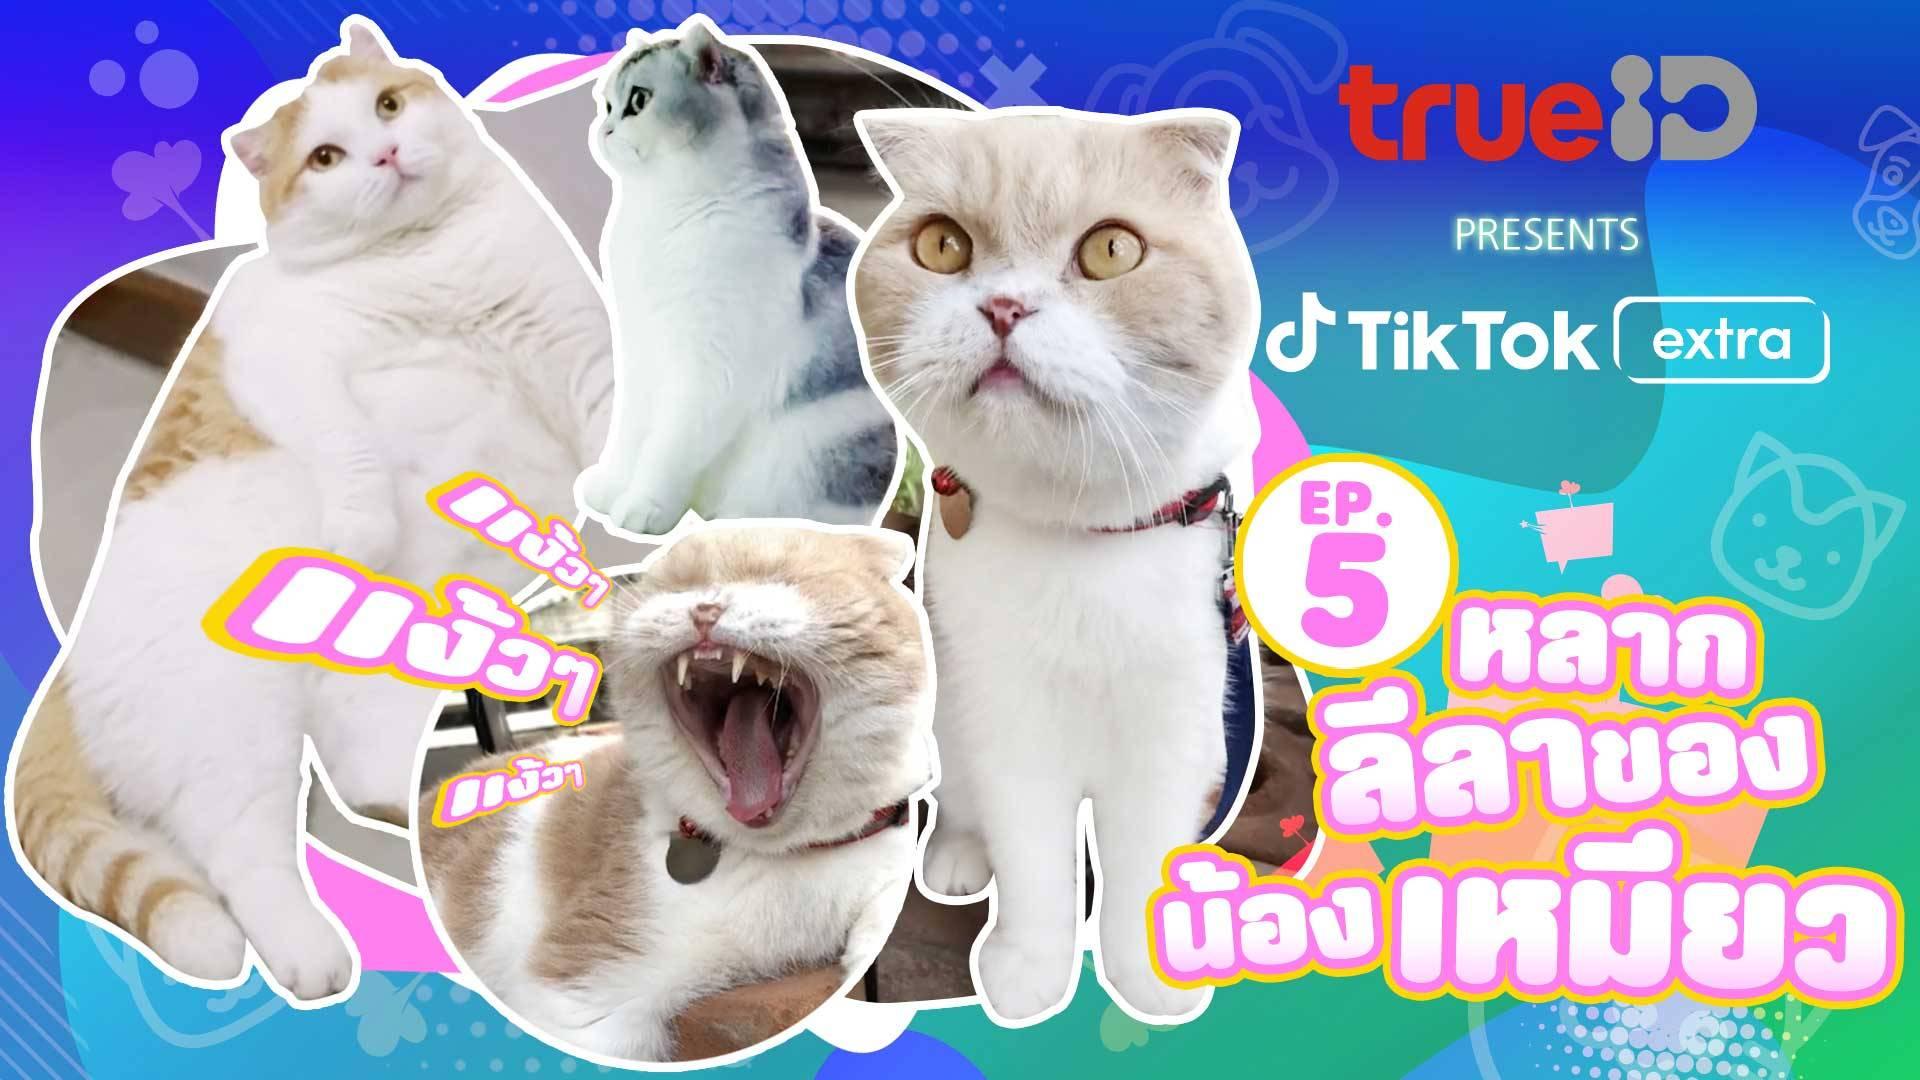 TrueID presents TikTok Extra : Pets Ep5 รวมมิตรสัตว์เลี้ยง สุดน่ารักจาก TikTok